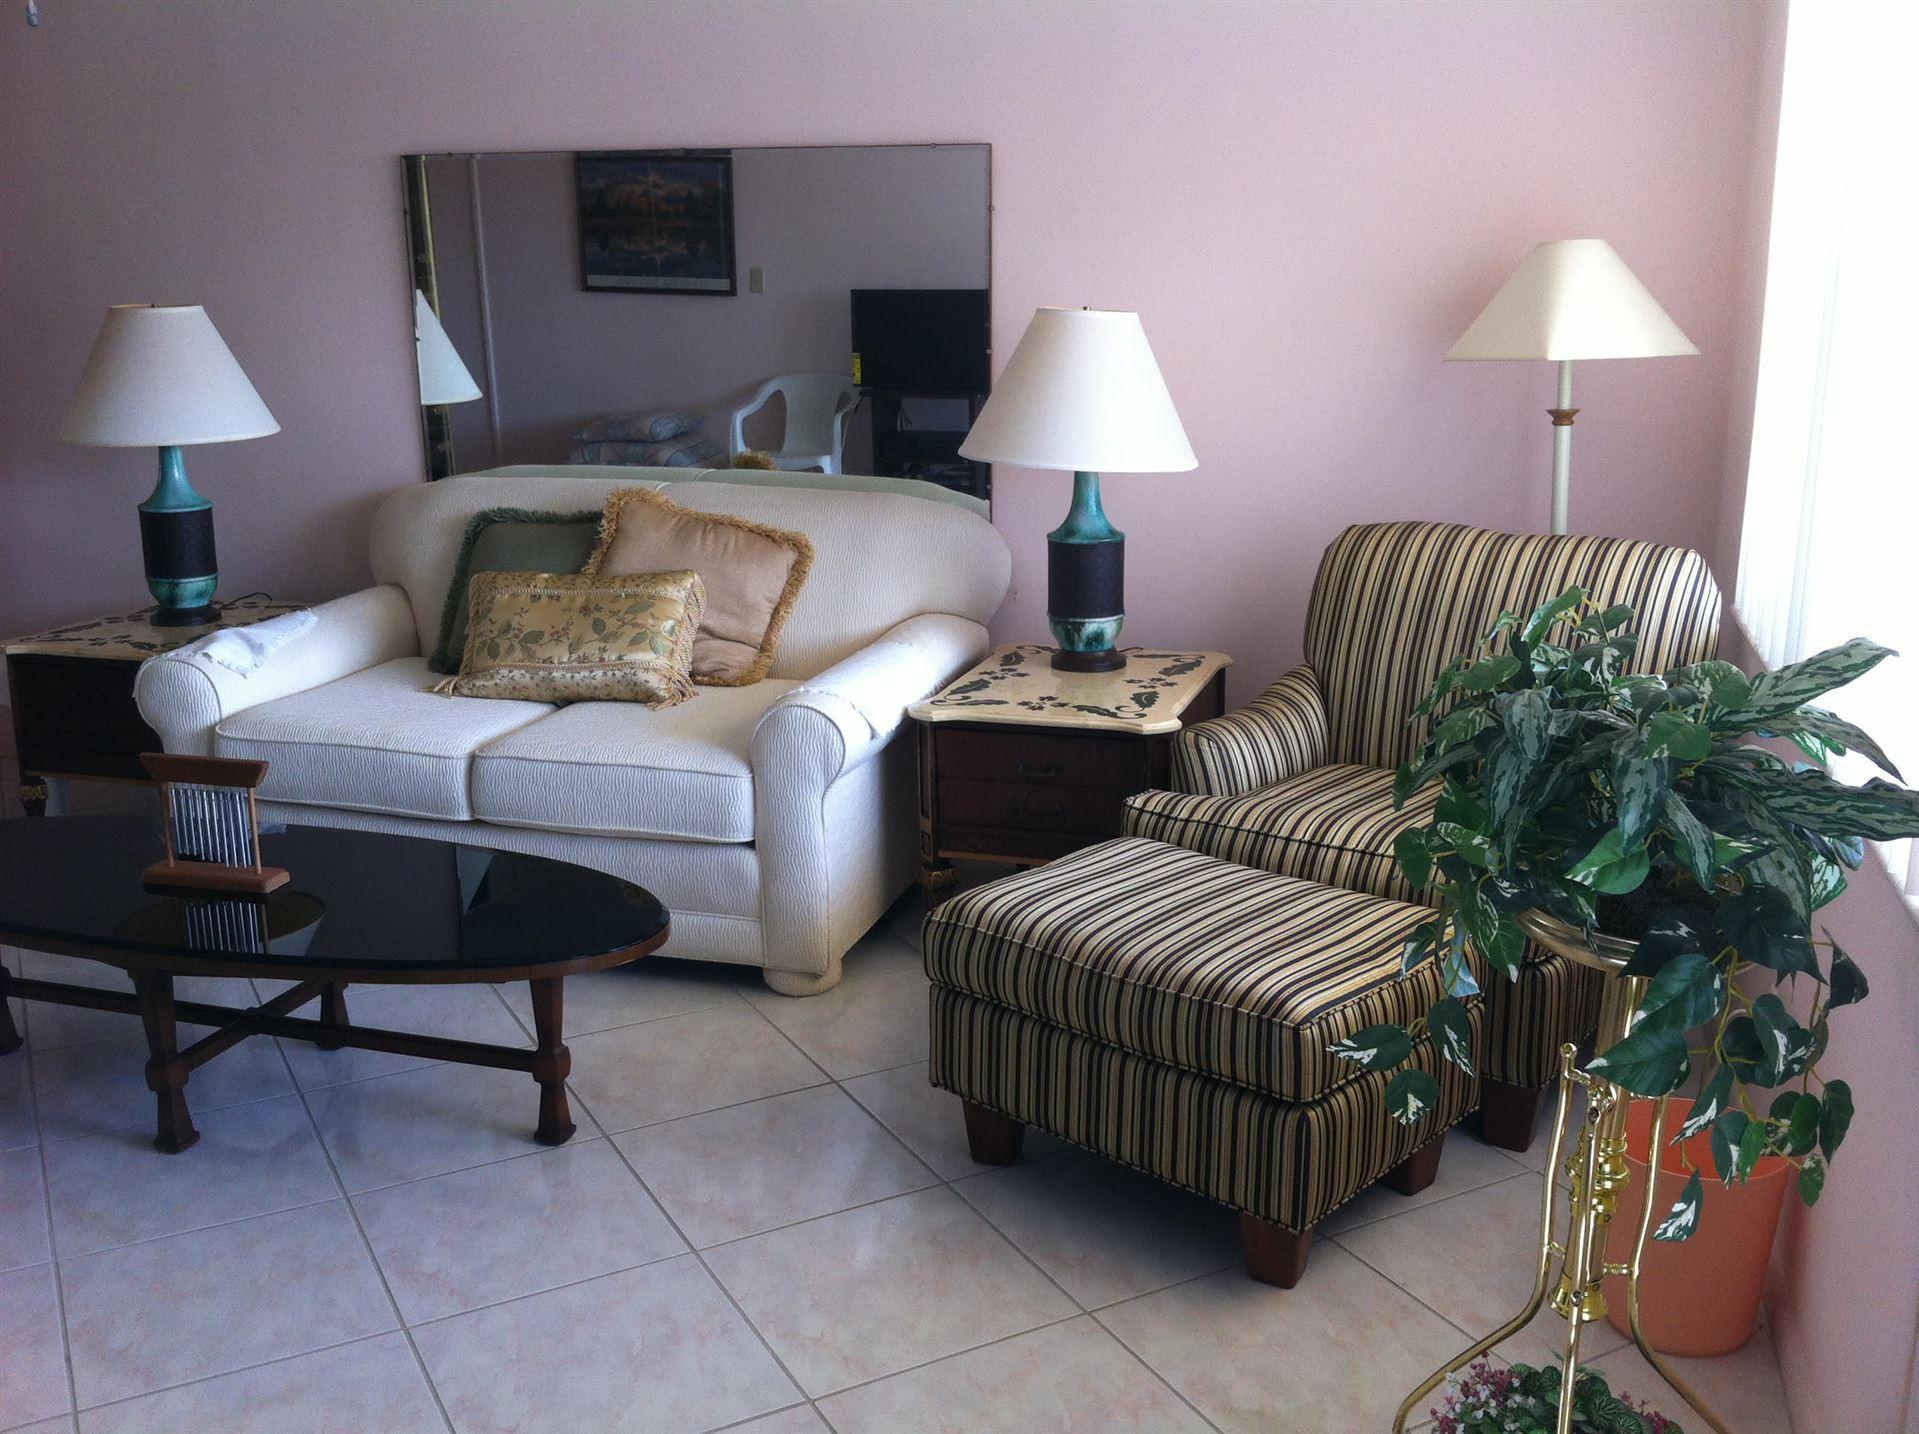 51 Kingswood C, West Palm Beach, FL 33417 - MLS#: RX-10701441